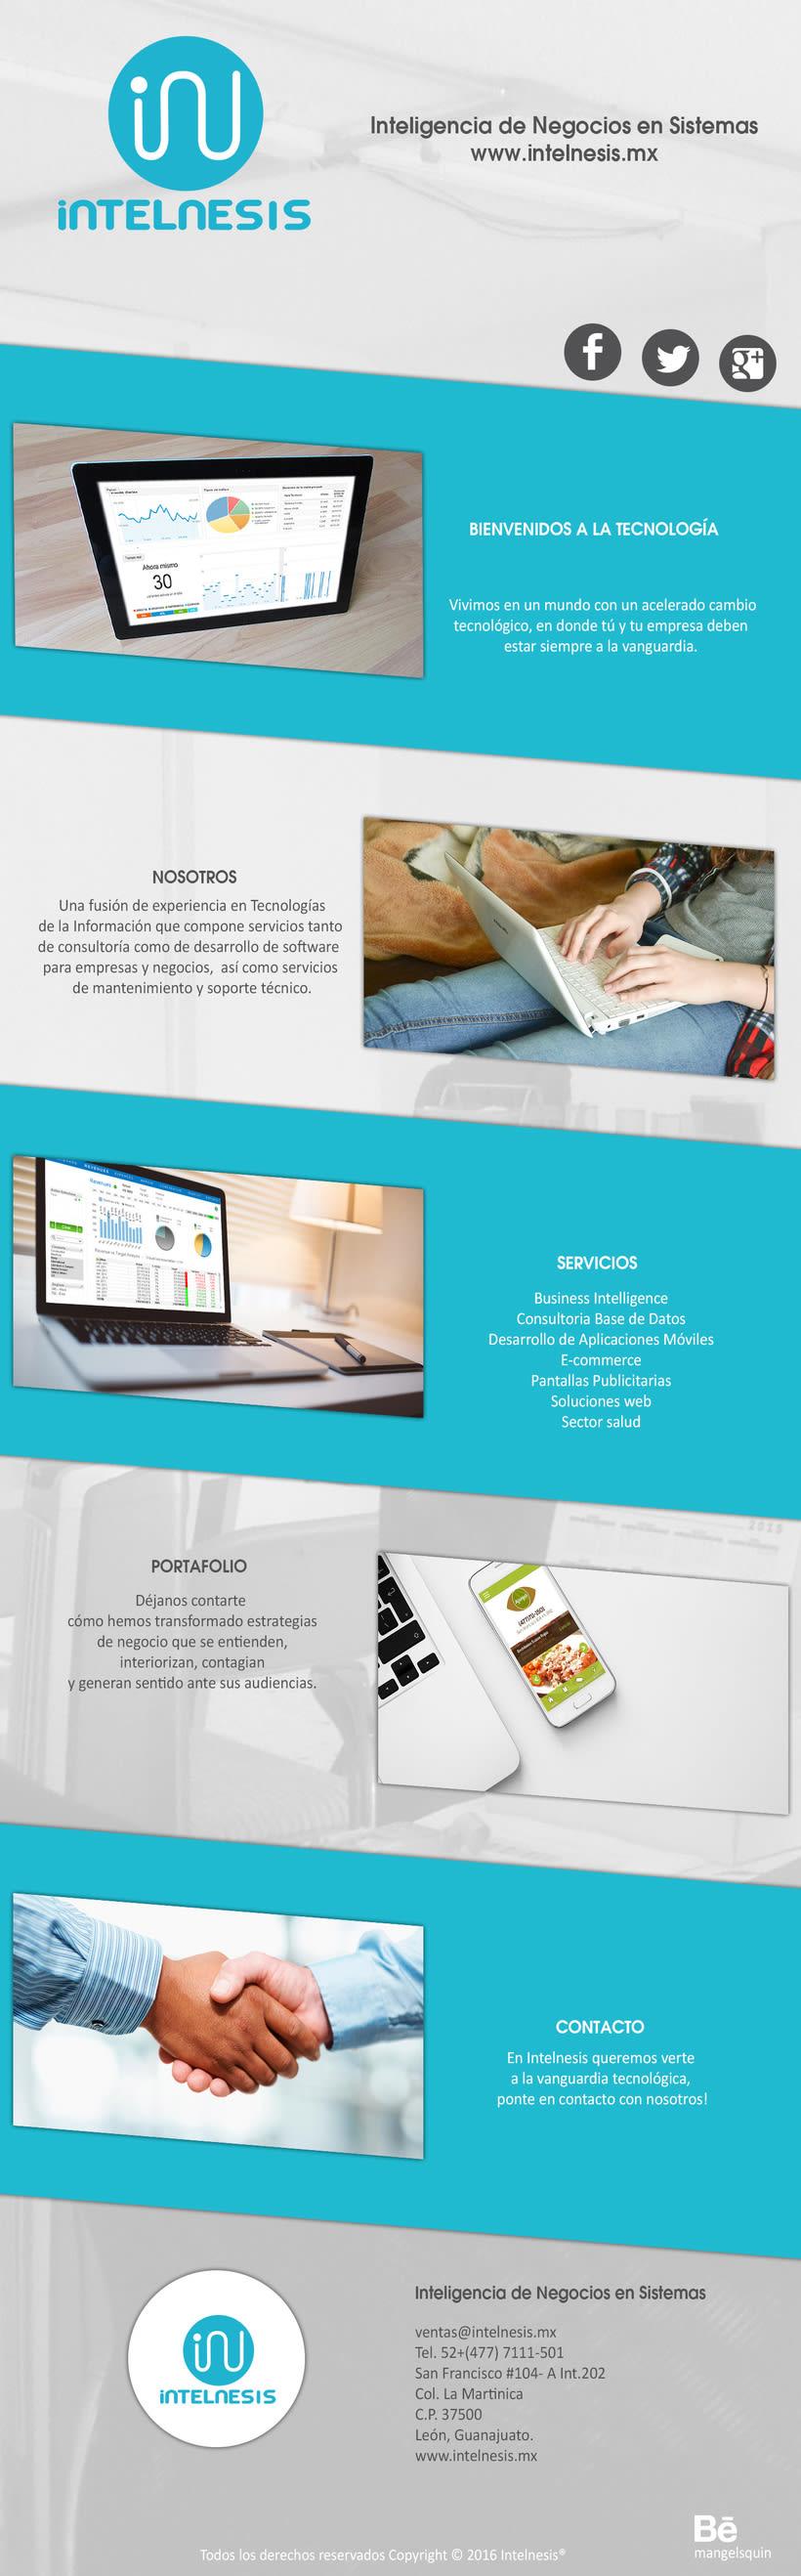 Intelnesis sitio web -1